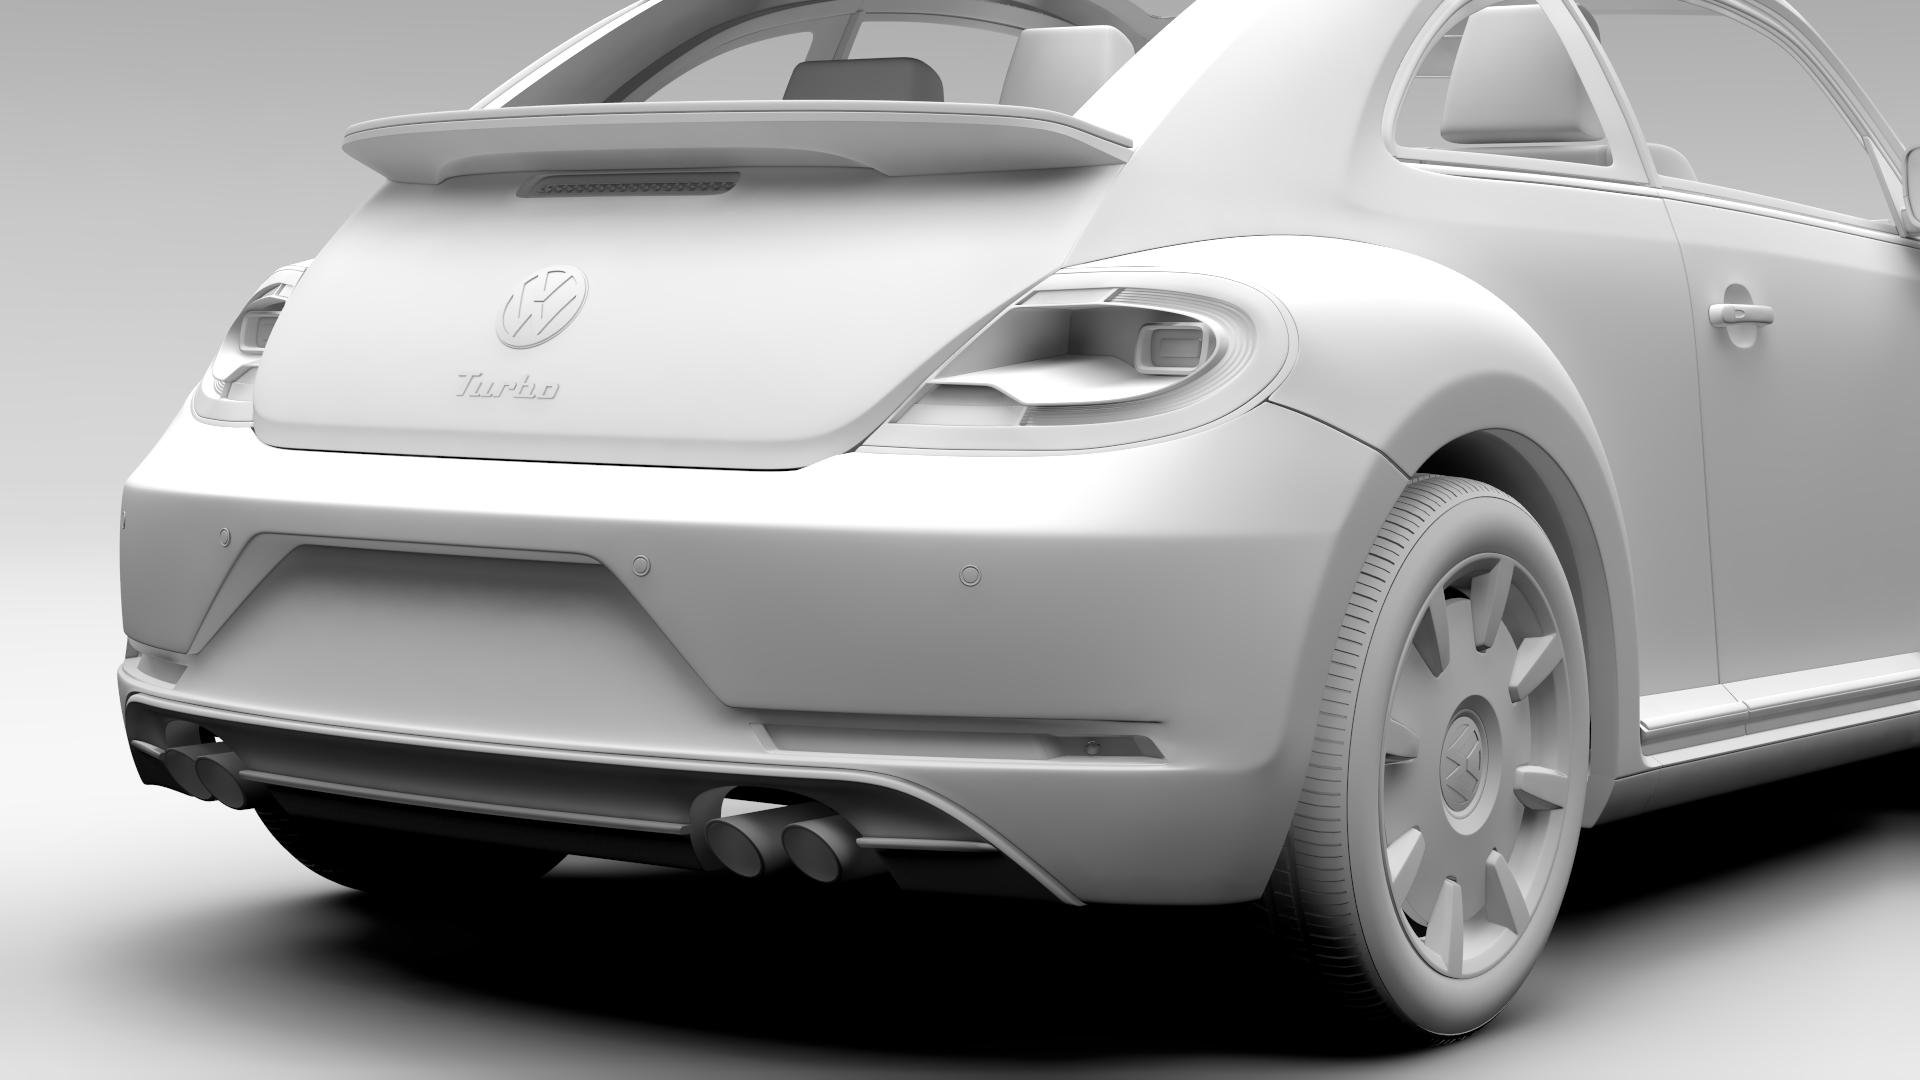 vw beetle turbo 2017 3d model 3ds max fbx c4d lwo ma mb hrc xsi obj 221674